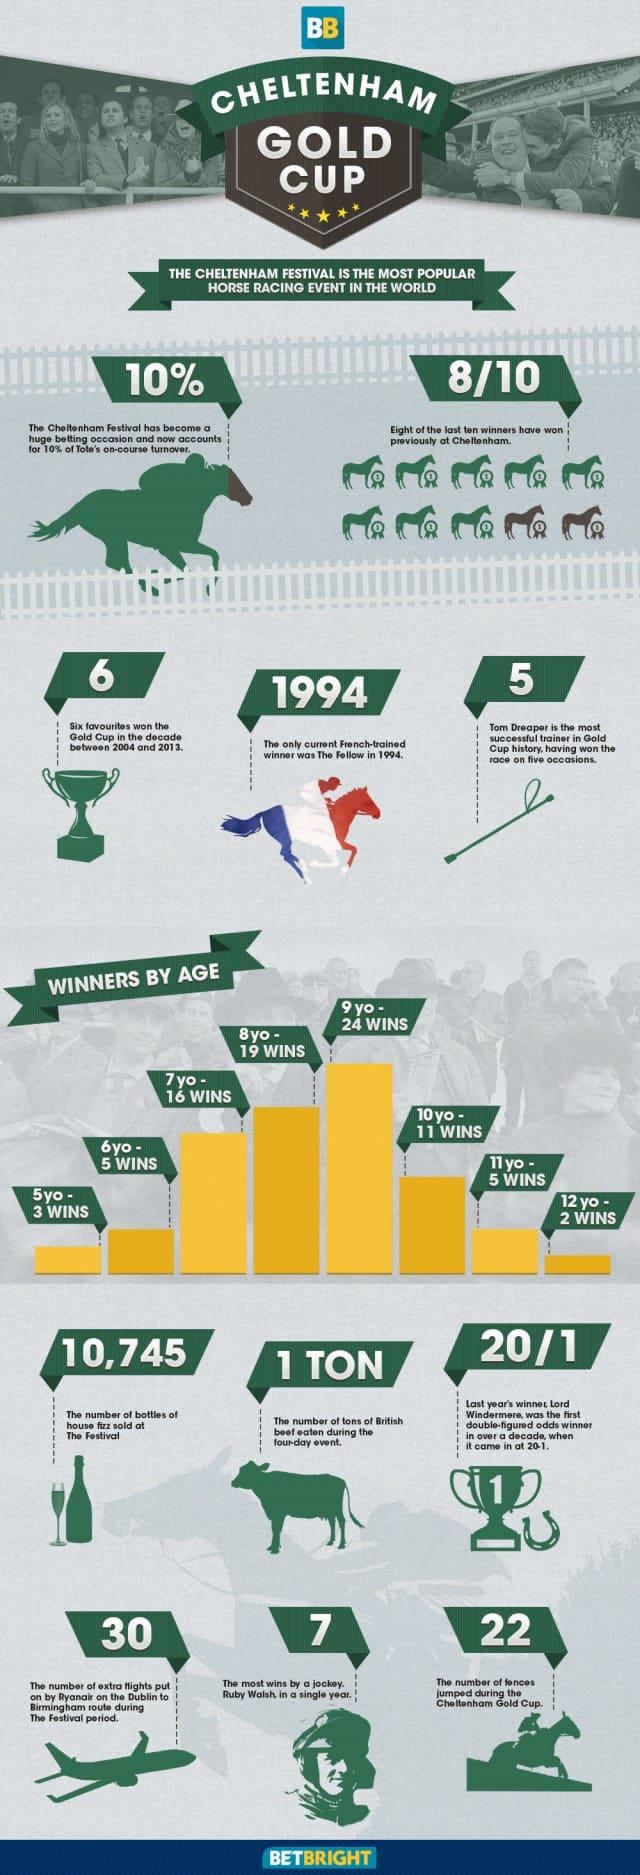 Cheltenham Gold Cup Infographic